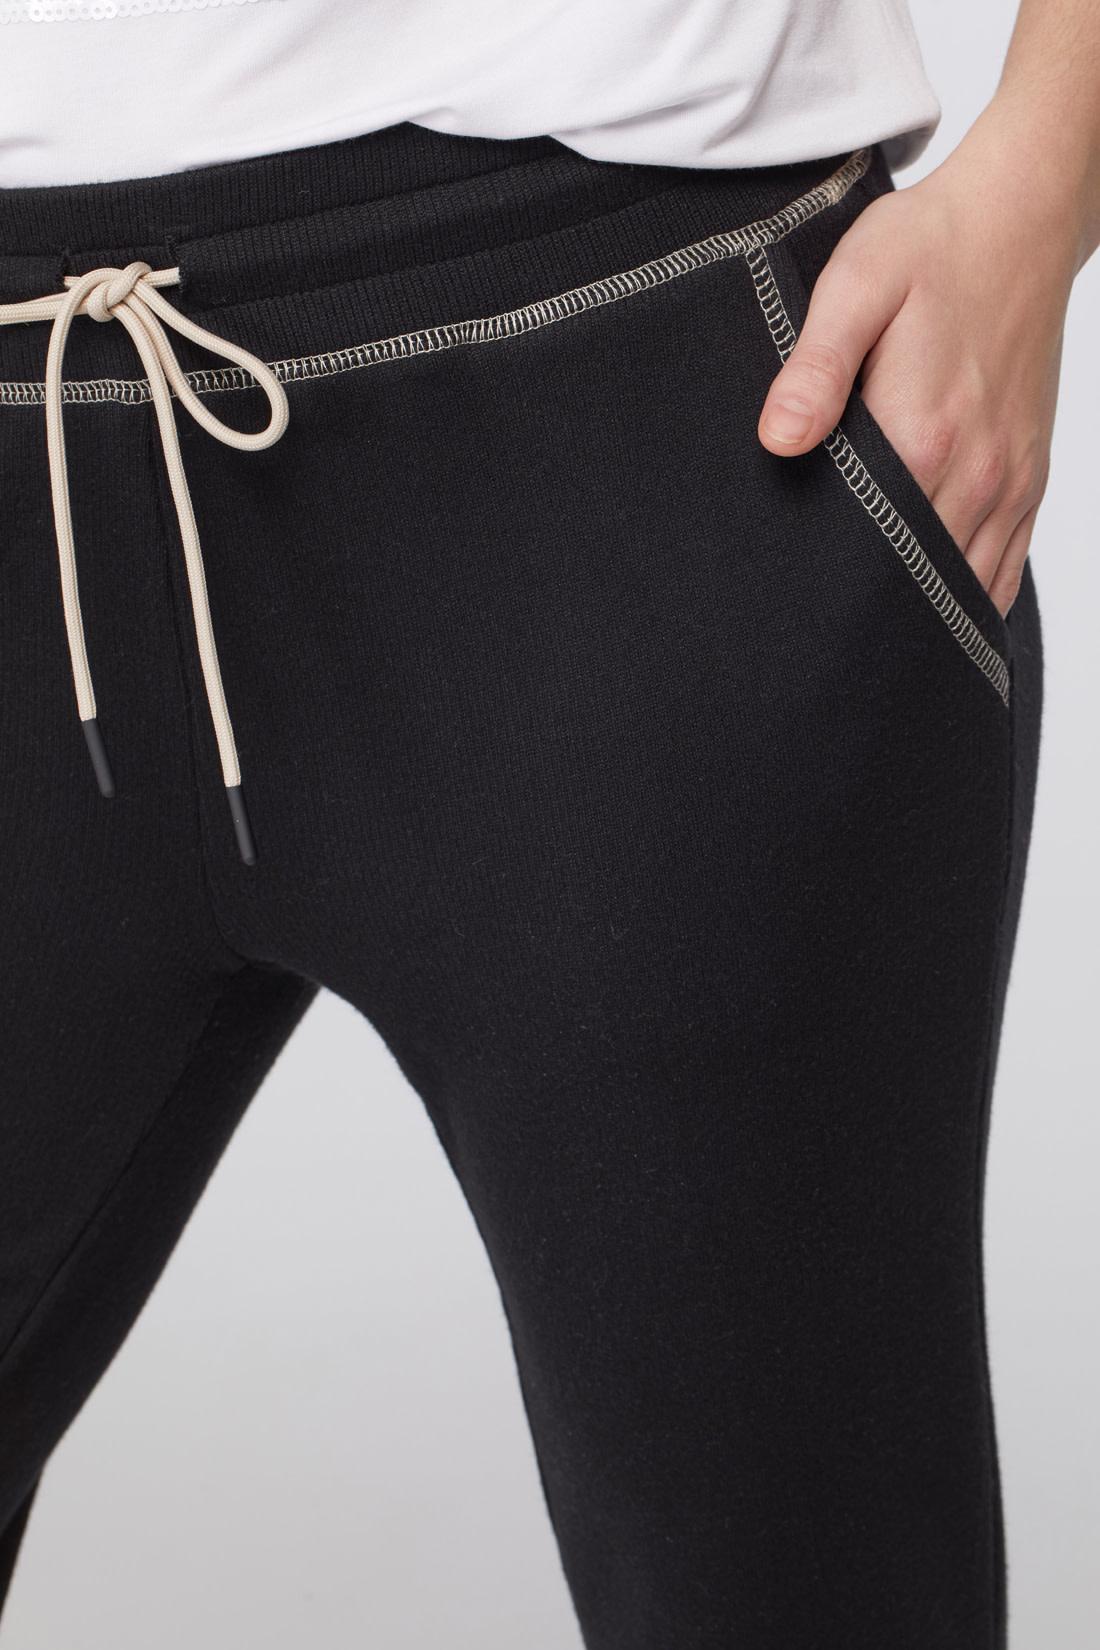 Tribal Jogger w/ Contrast Stitching Black